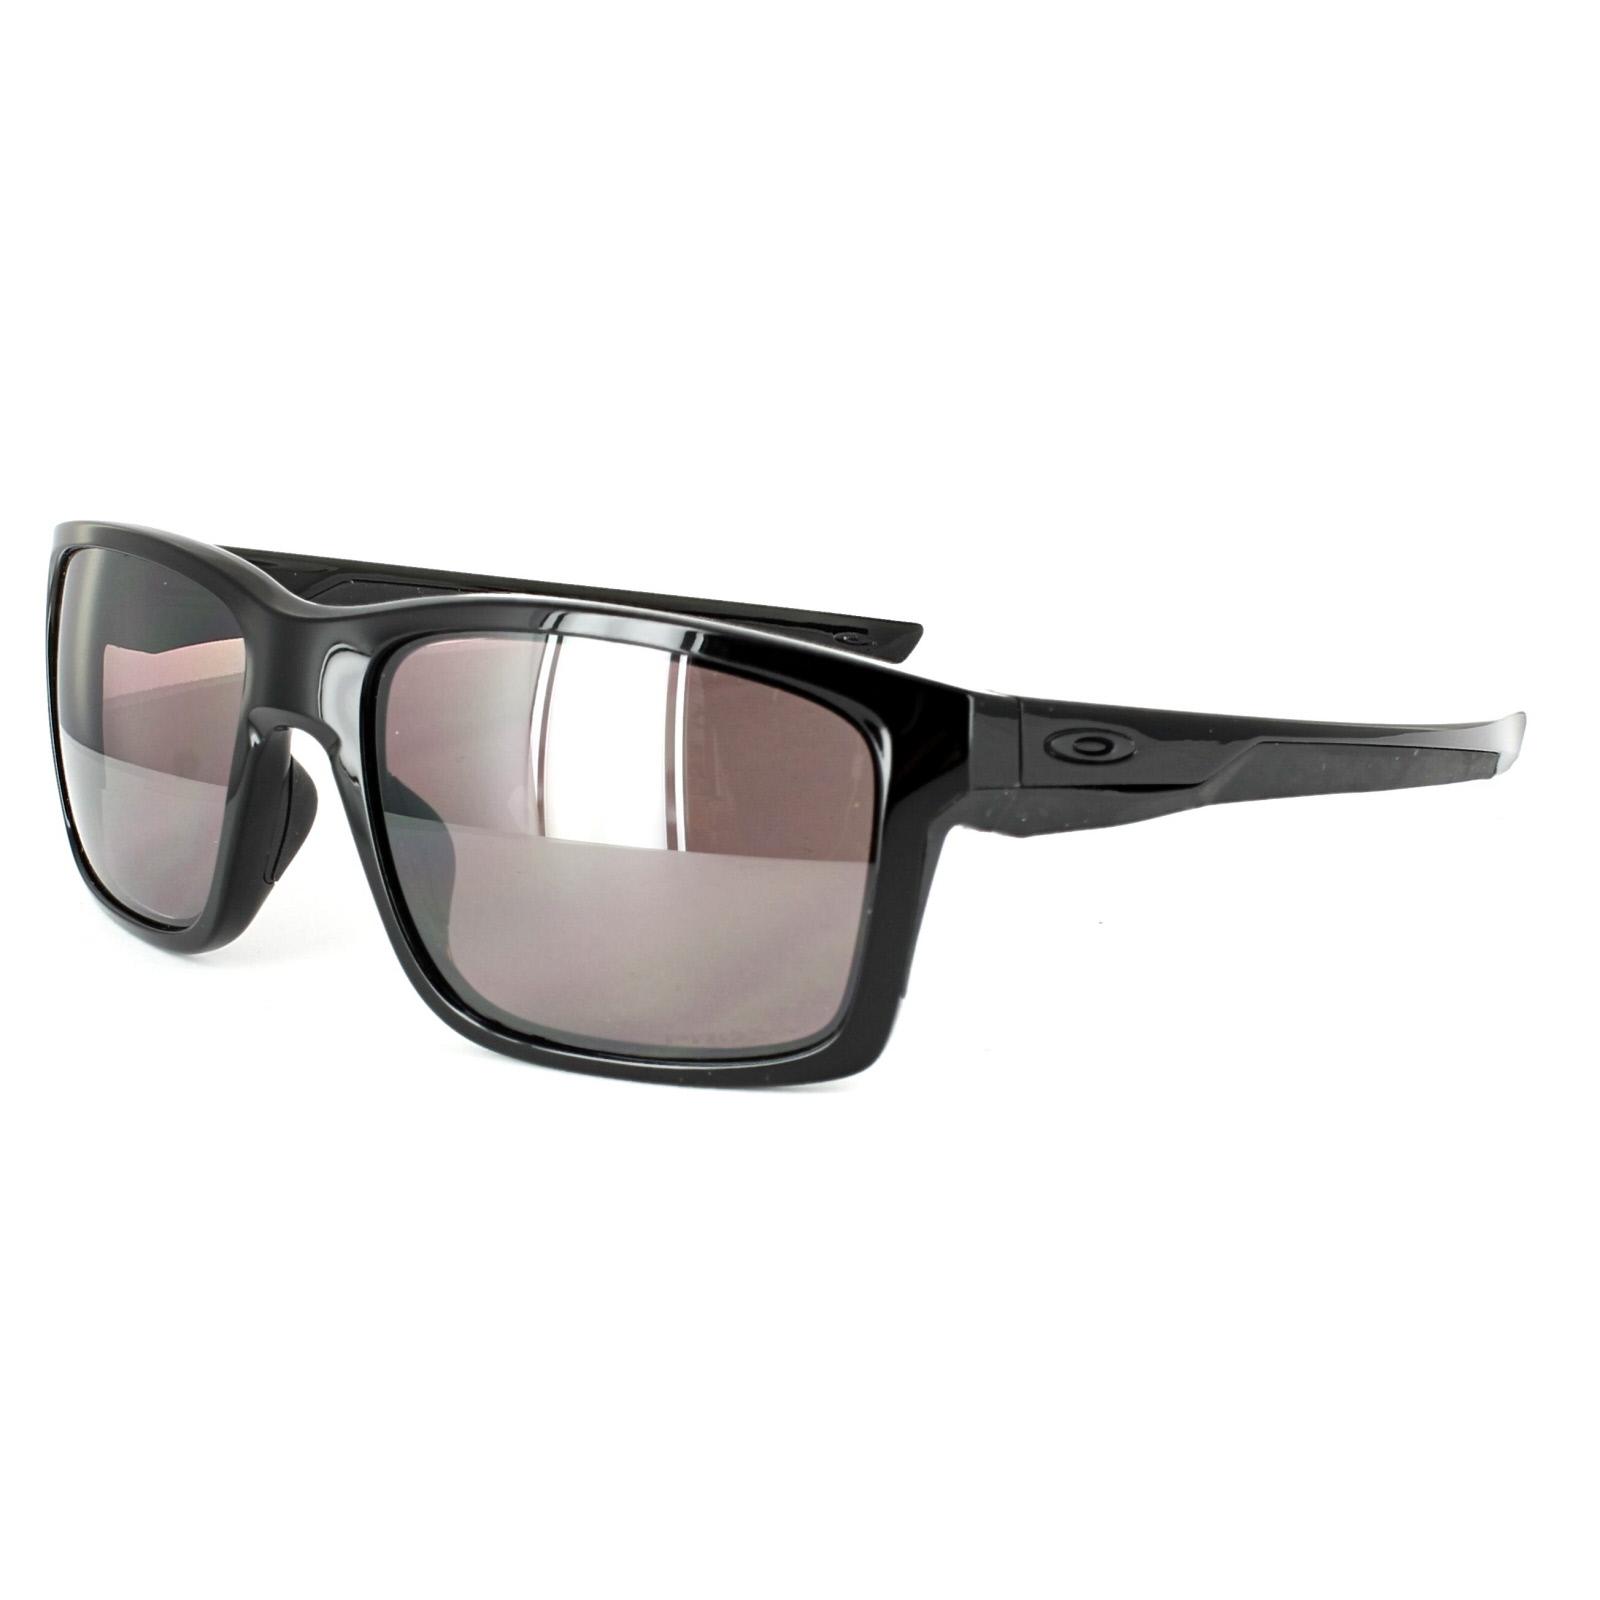 oakley sunglasses prizm  Oakley Sunglasses Mainlink OO9264-08 Polished Black Prizm Daily ...